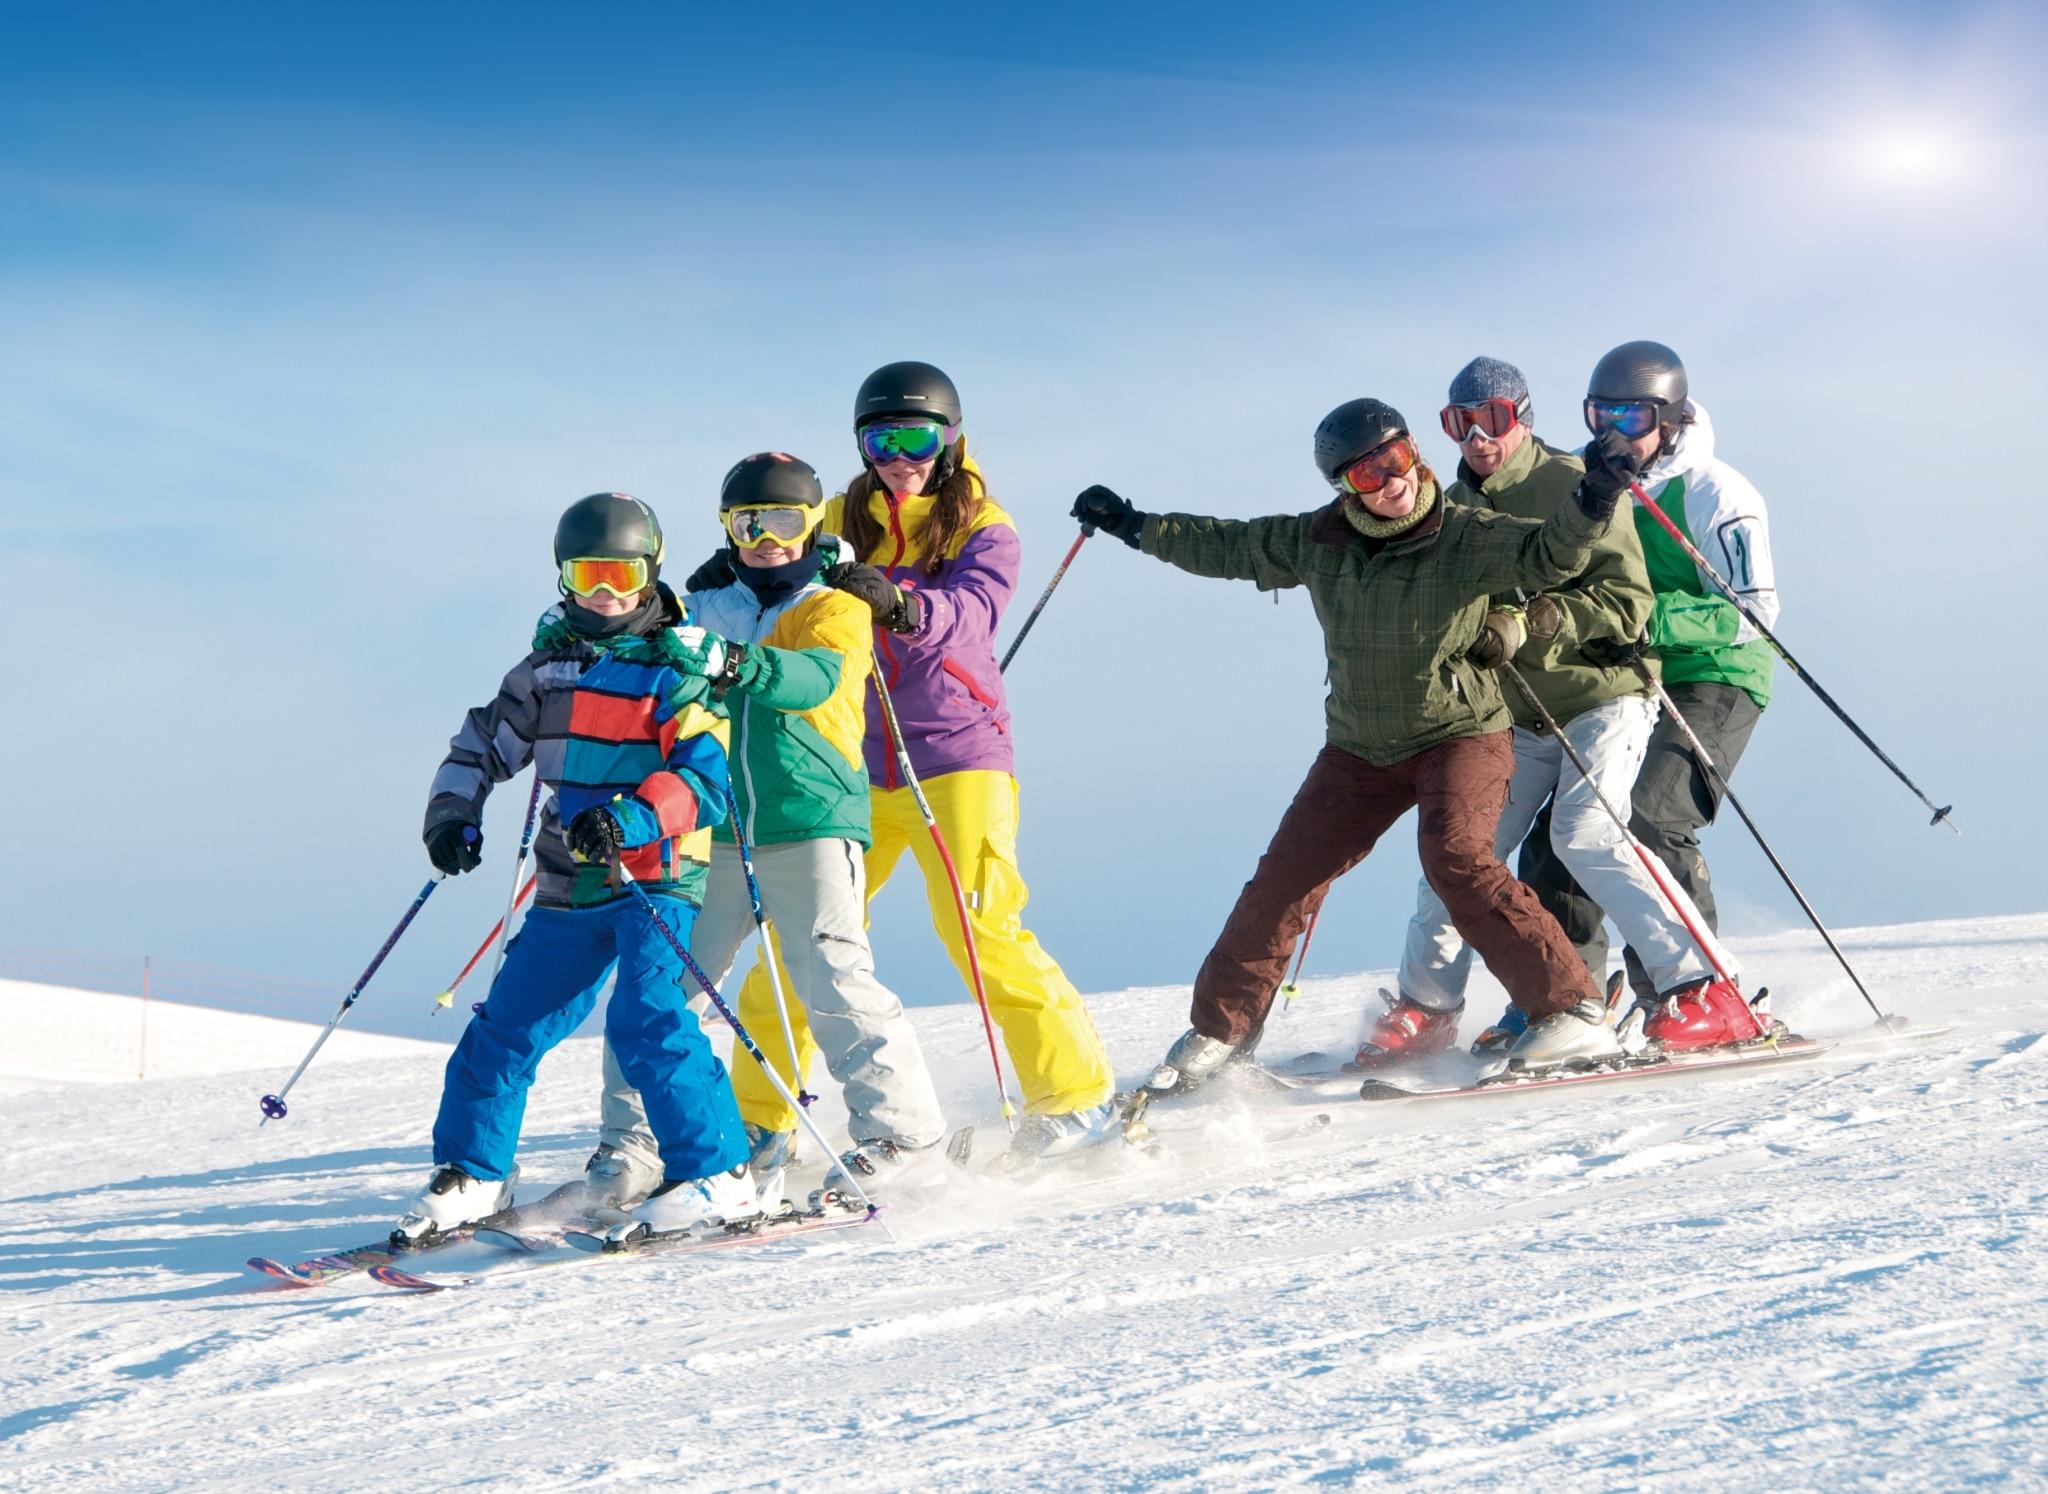 Familien-Skiurlaub am Arlberg